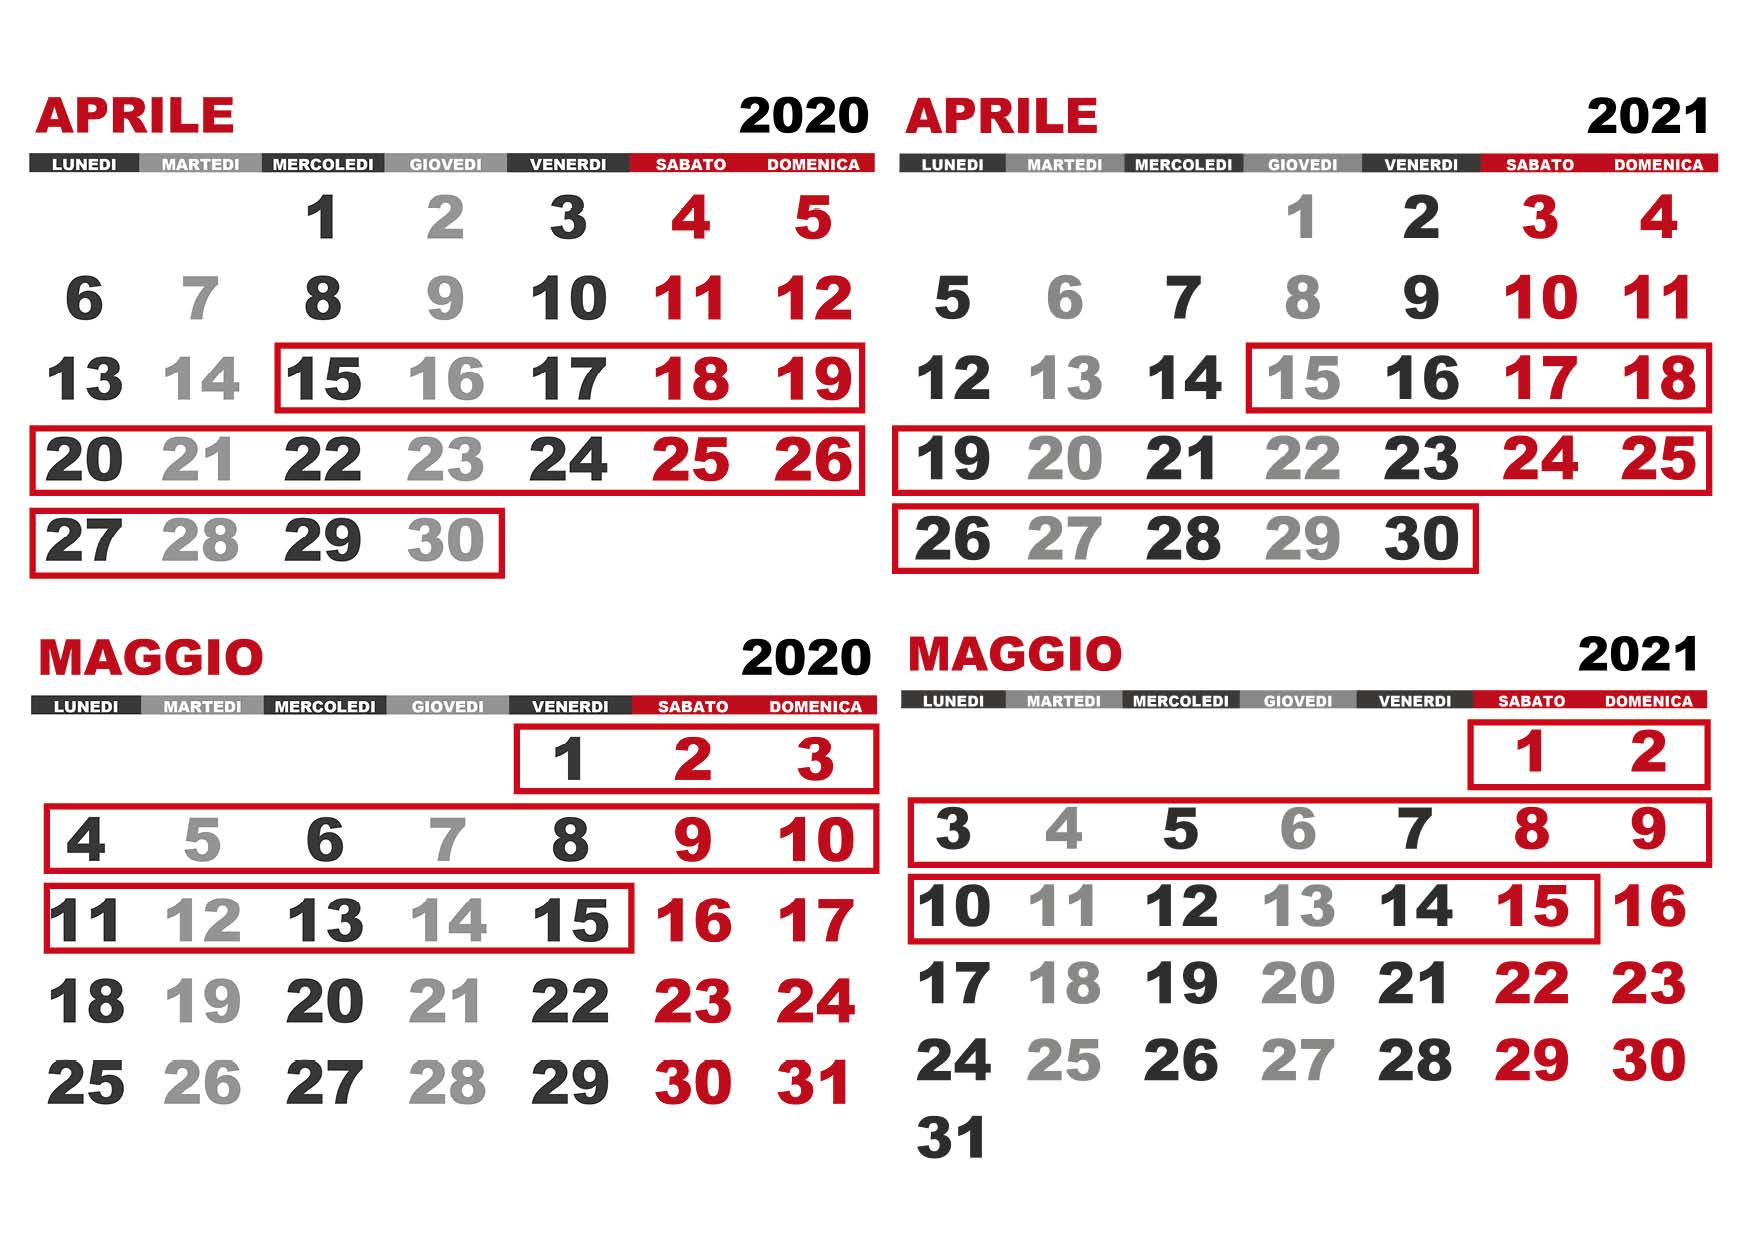 https://epiprev.it/documenti/get_image.php?img=files/2021/blog-made/calendario-aprile20-maggio21.jpg